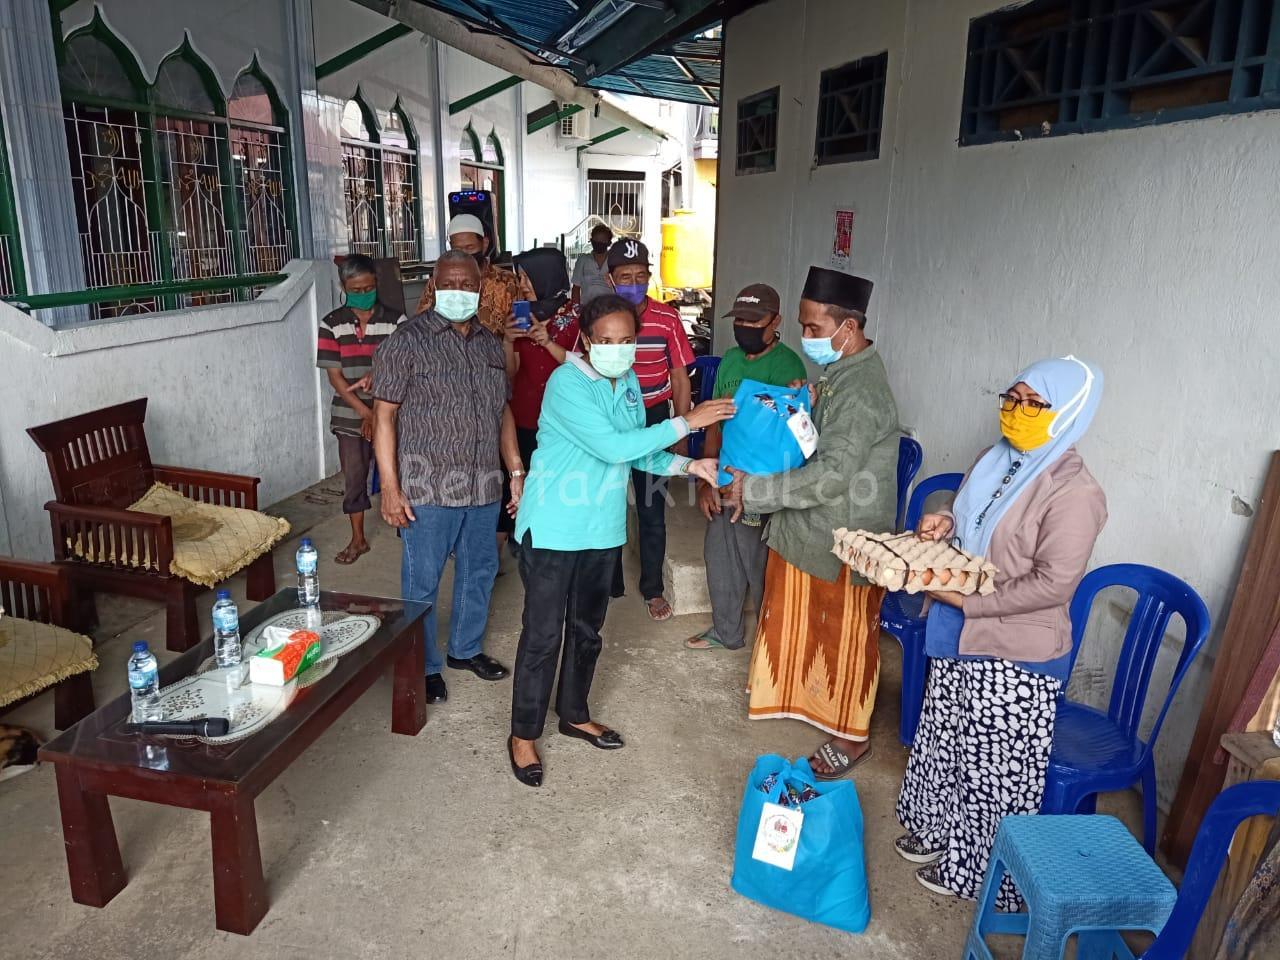 Lagi, Keluarga Mandacan -Kiriweno Serahkan 521 Paket Bama ke Ratusan Umat di Manokwari 5 IMG 20200418 WA0035